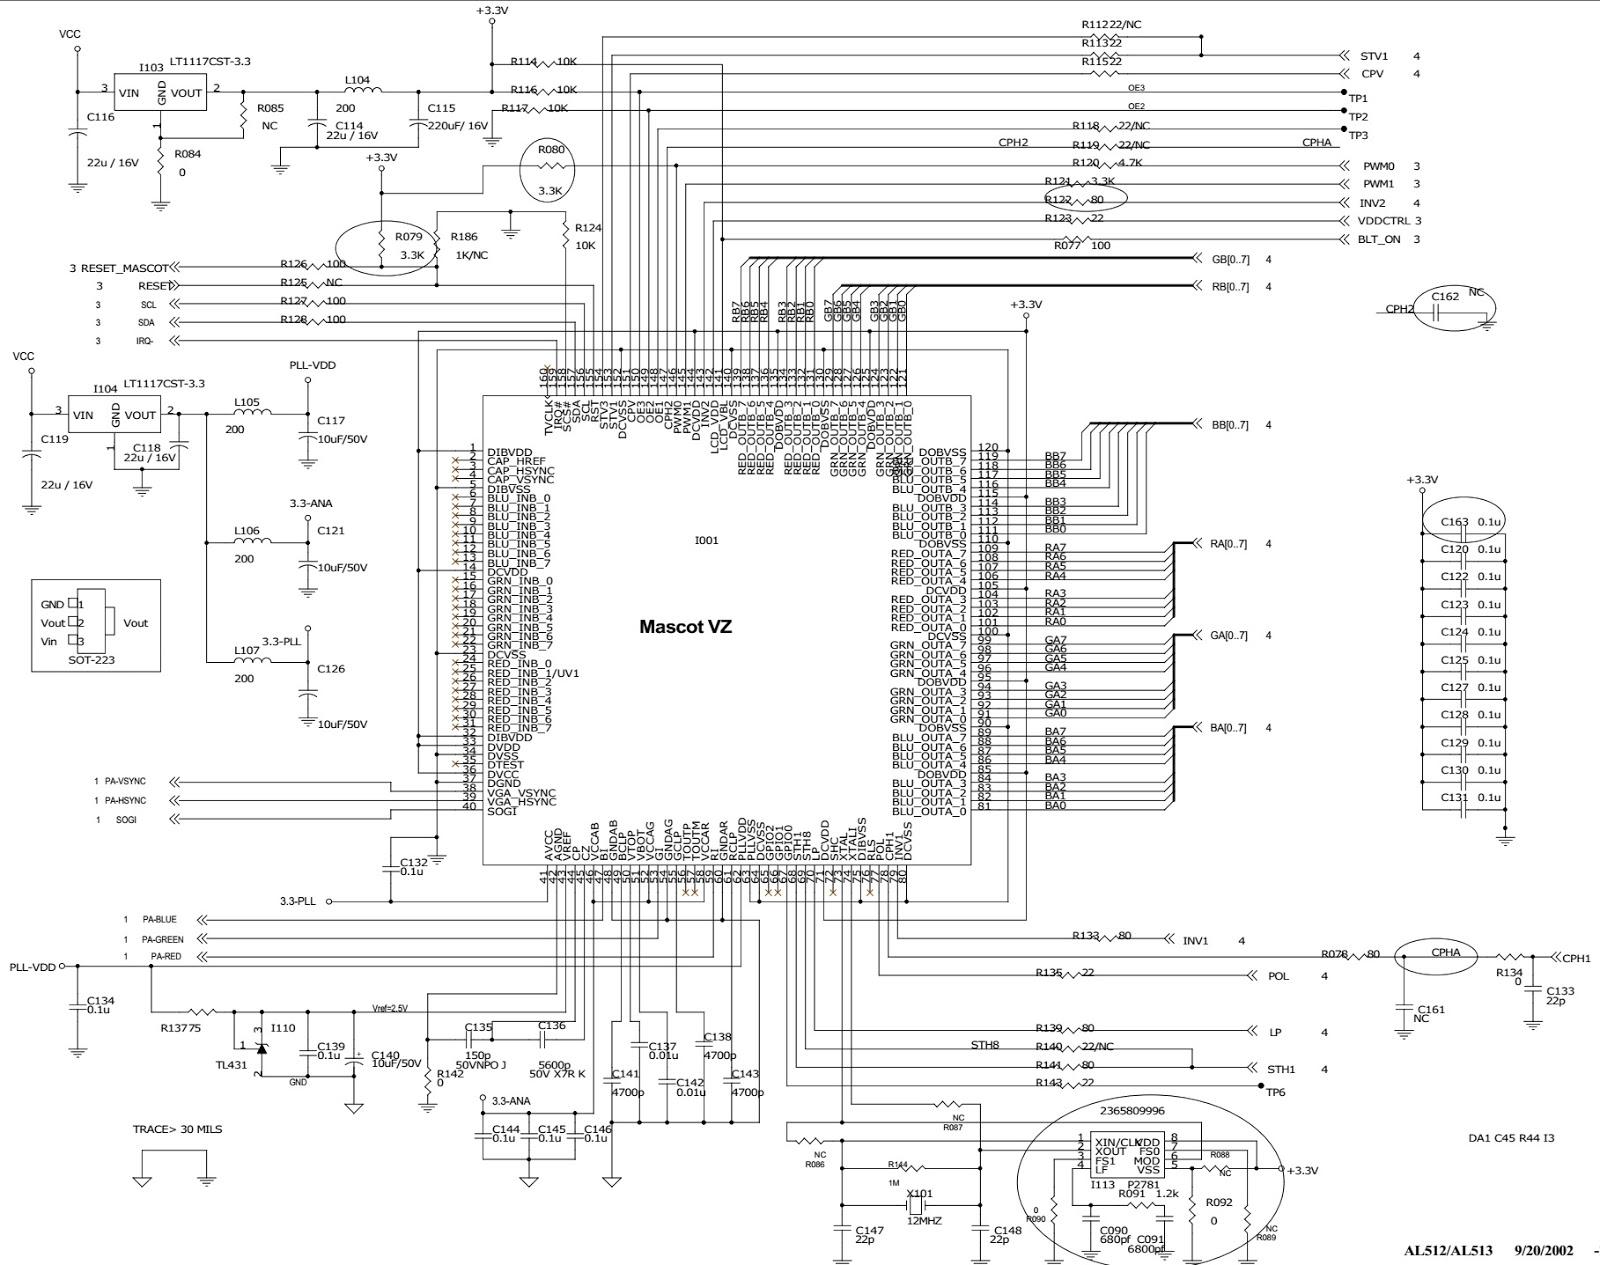 aoc al512  u2013 aoc al513  u2013 15 inch tft lcd monitor  u2013 circuit